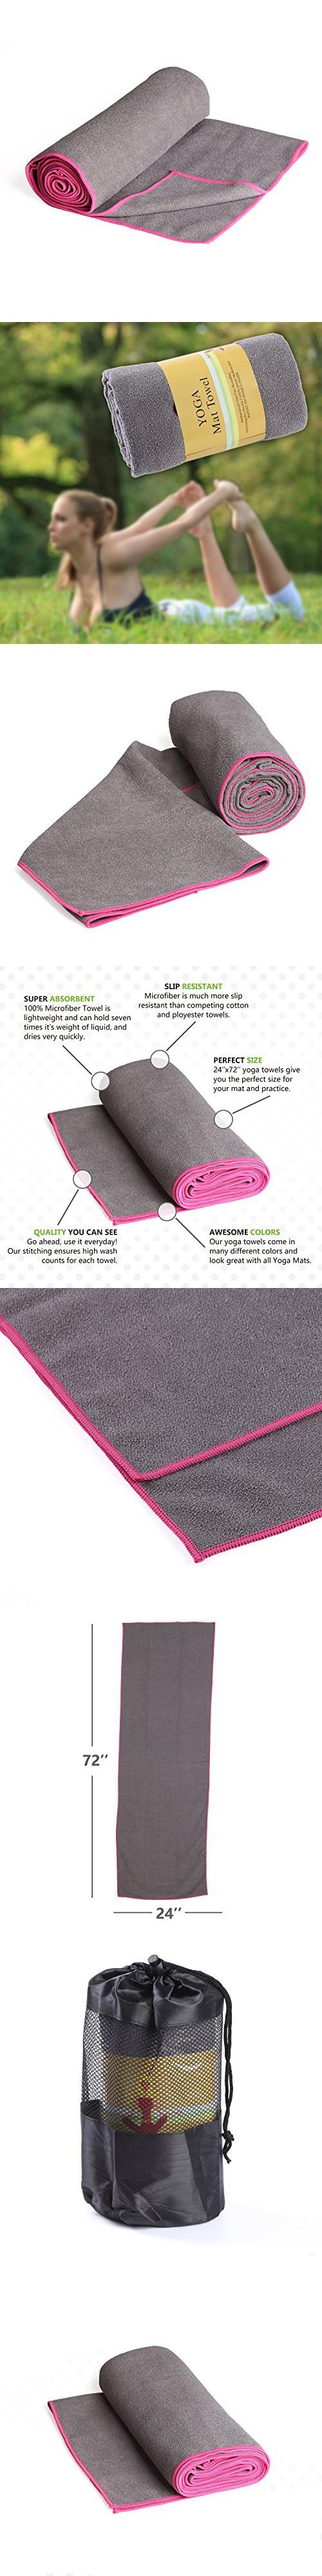 "Hot Yoga Towel [24"" x 72""] IMISI Hot Yoga Towel - Non Slip, No Bacterium Softness Microfiber, High Adsorption Capacity, Water-Absorption for Hot Yoga, Pilates, Fitness-Machine Washable"